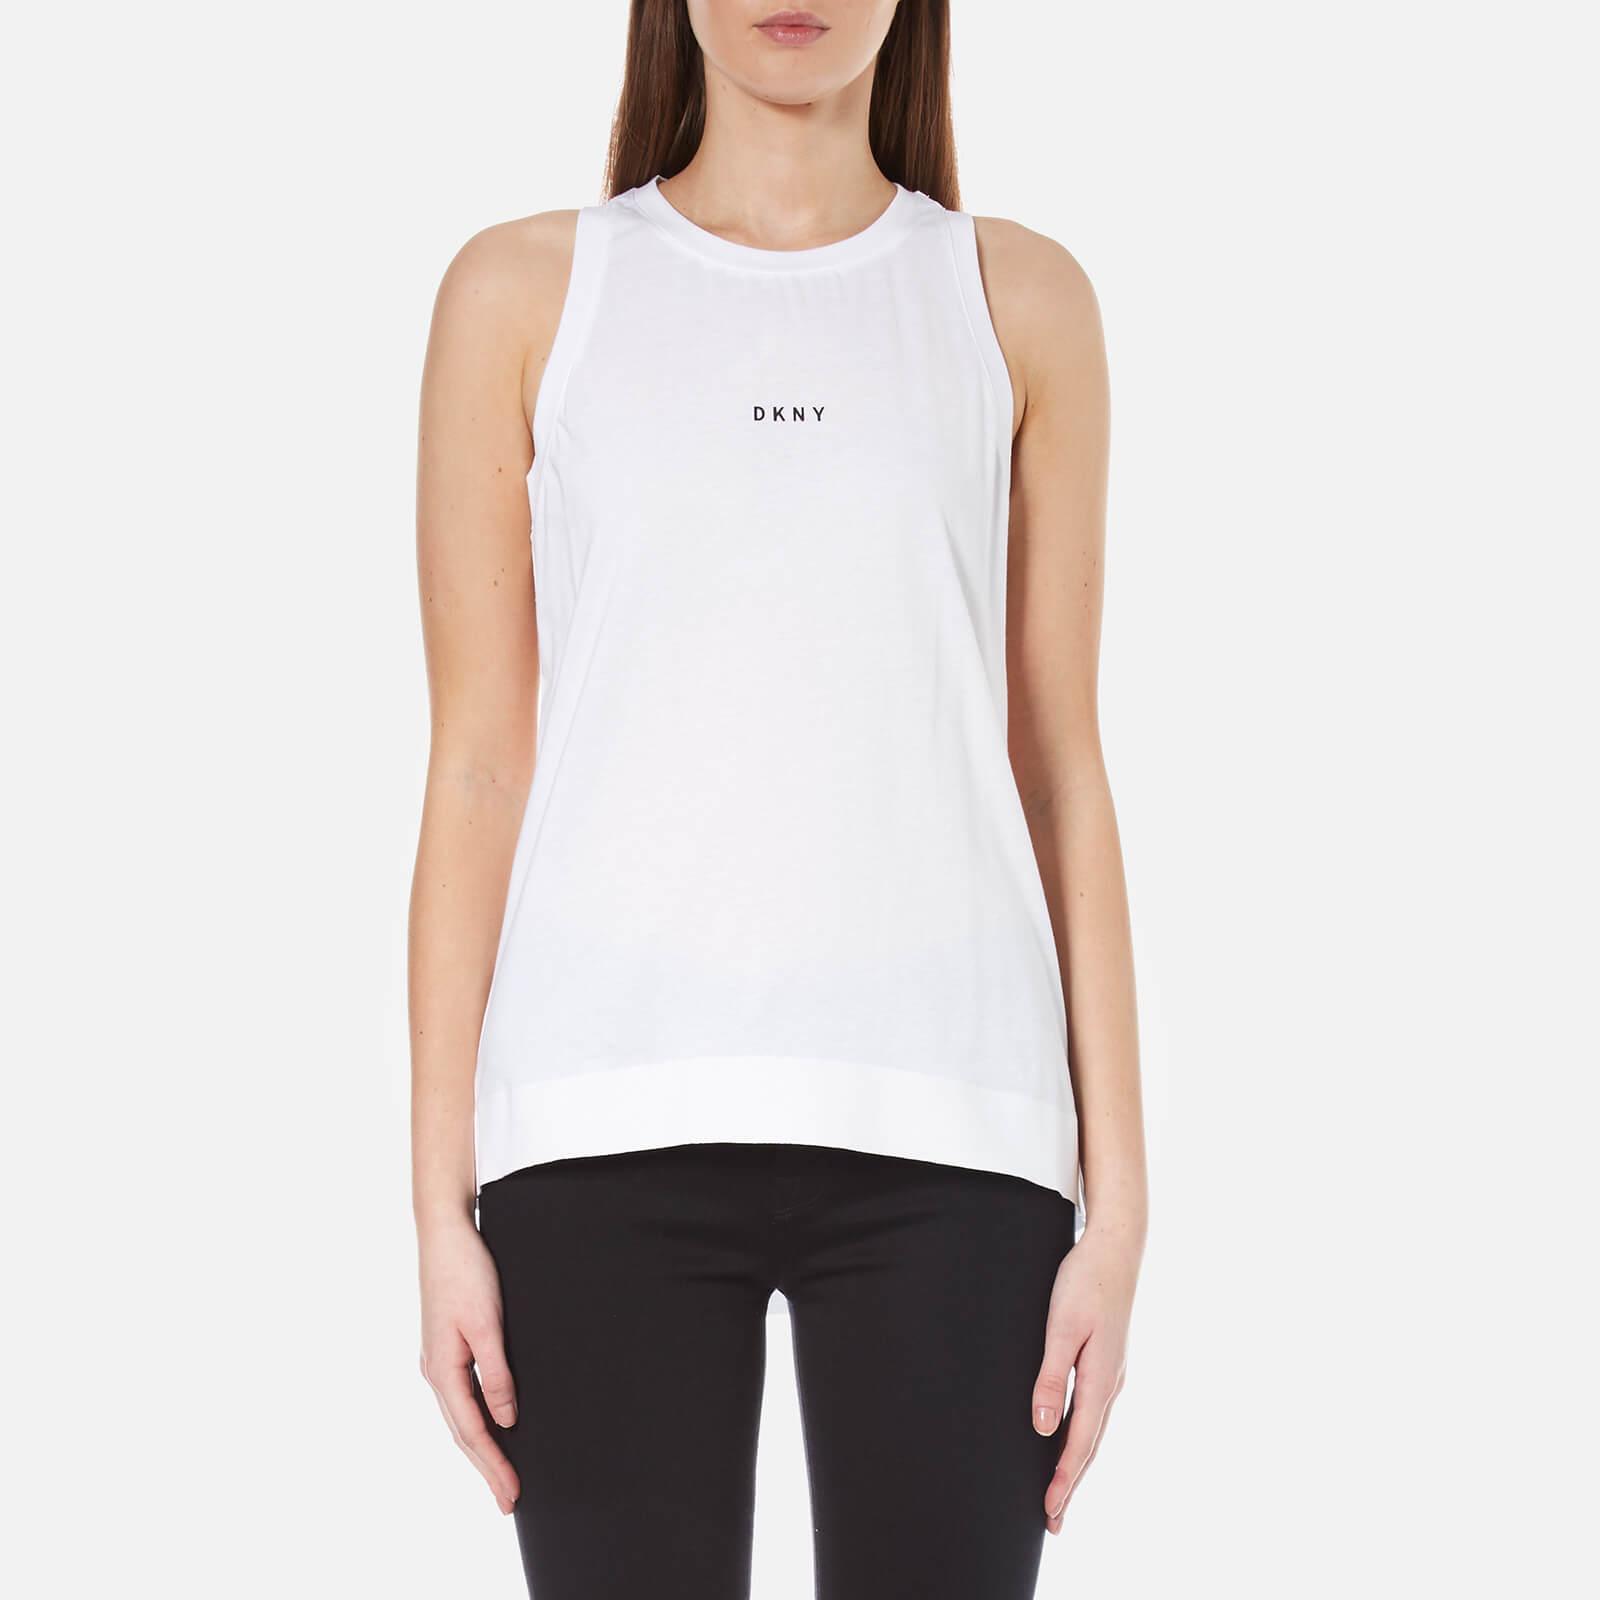 4760de5bf79ff2 DKNY Women s Sleeveless Crew Neck Tank with Bonded Hems and Logo - White  Clothing